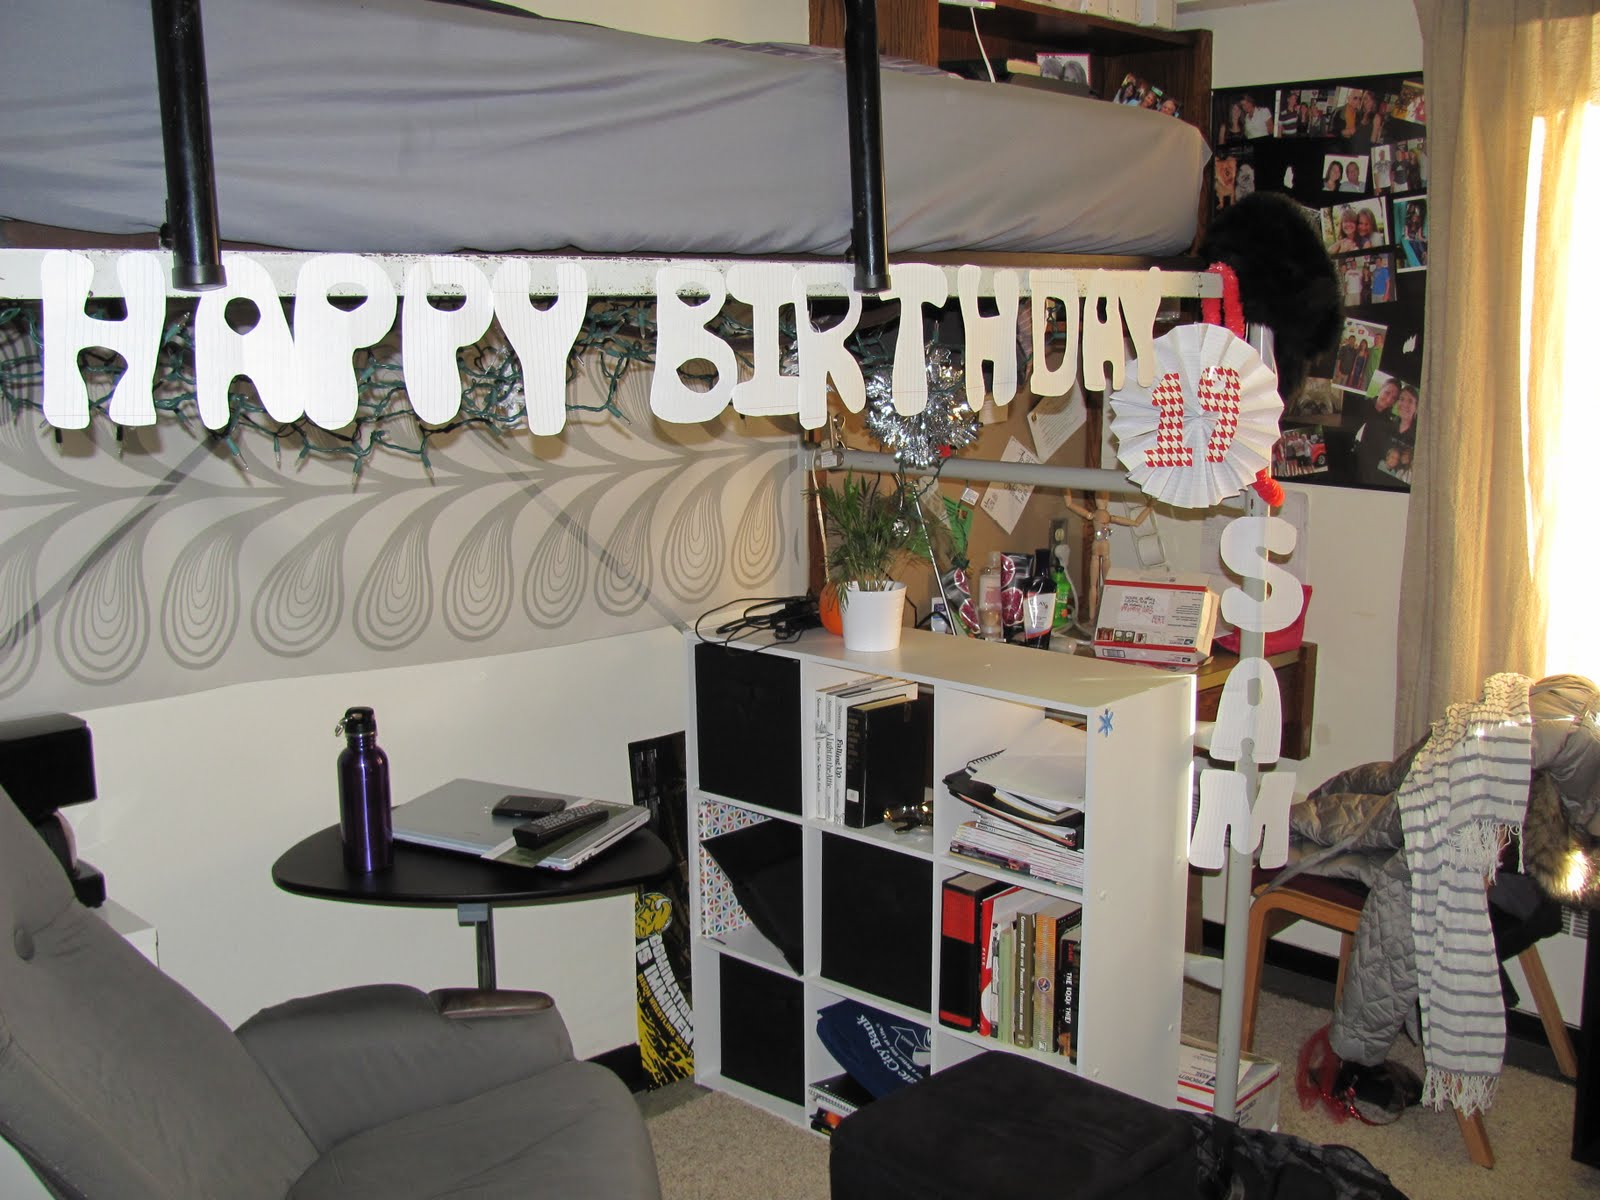 Miss Handy Hands Dorm Room Birthday Decorations